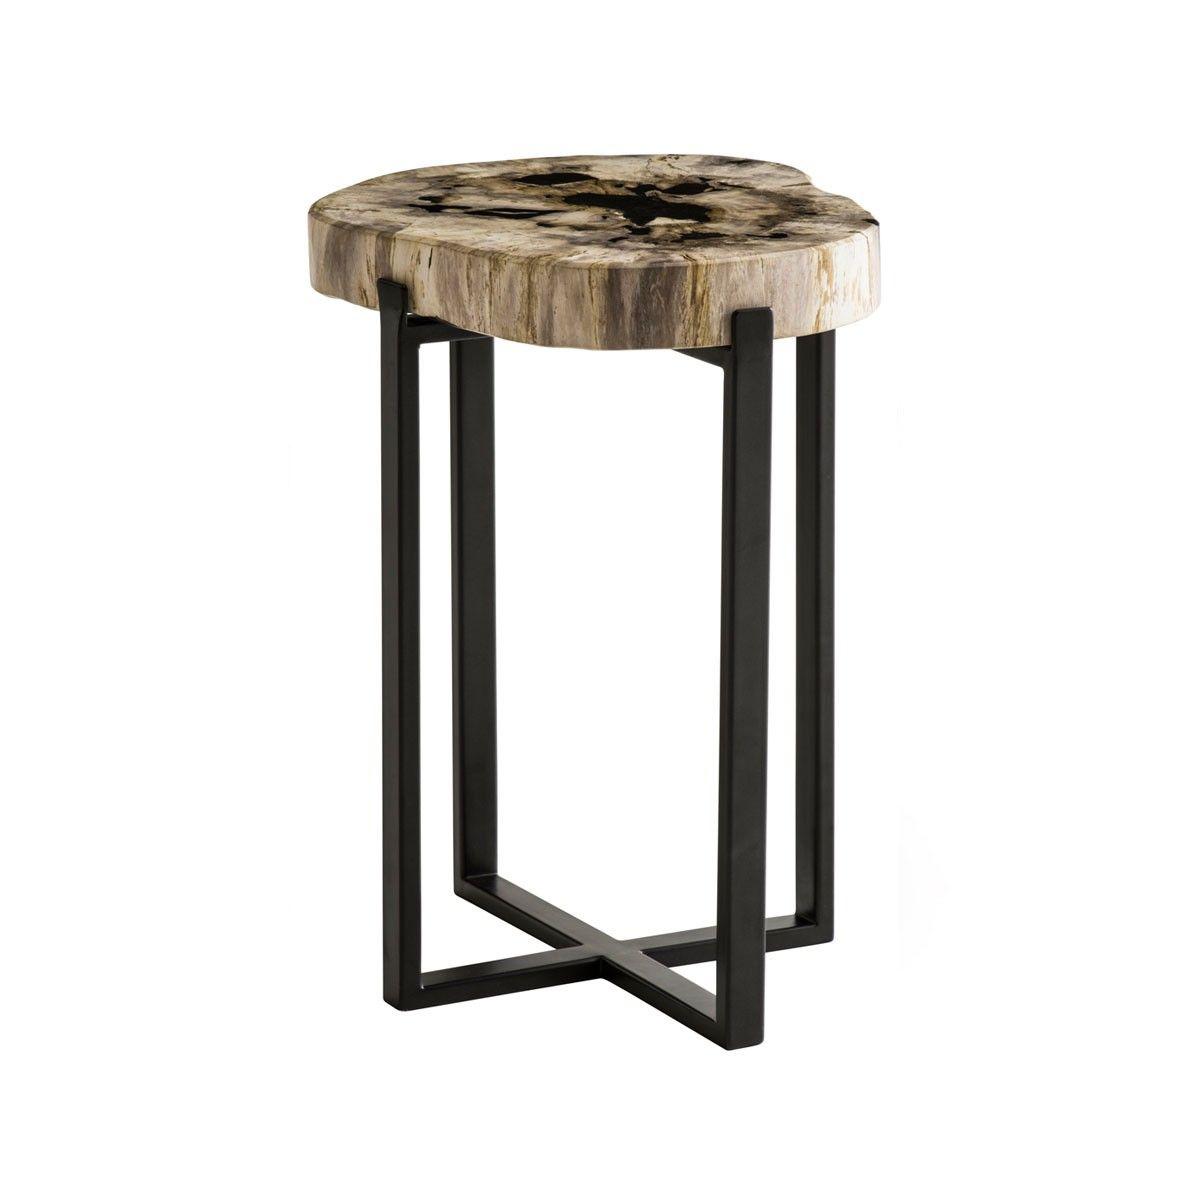 Petrified wood lamp table 55 x Weddings